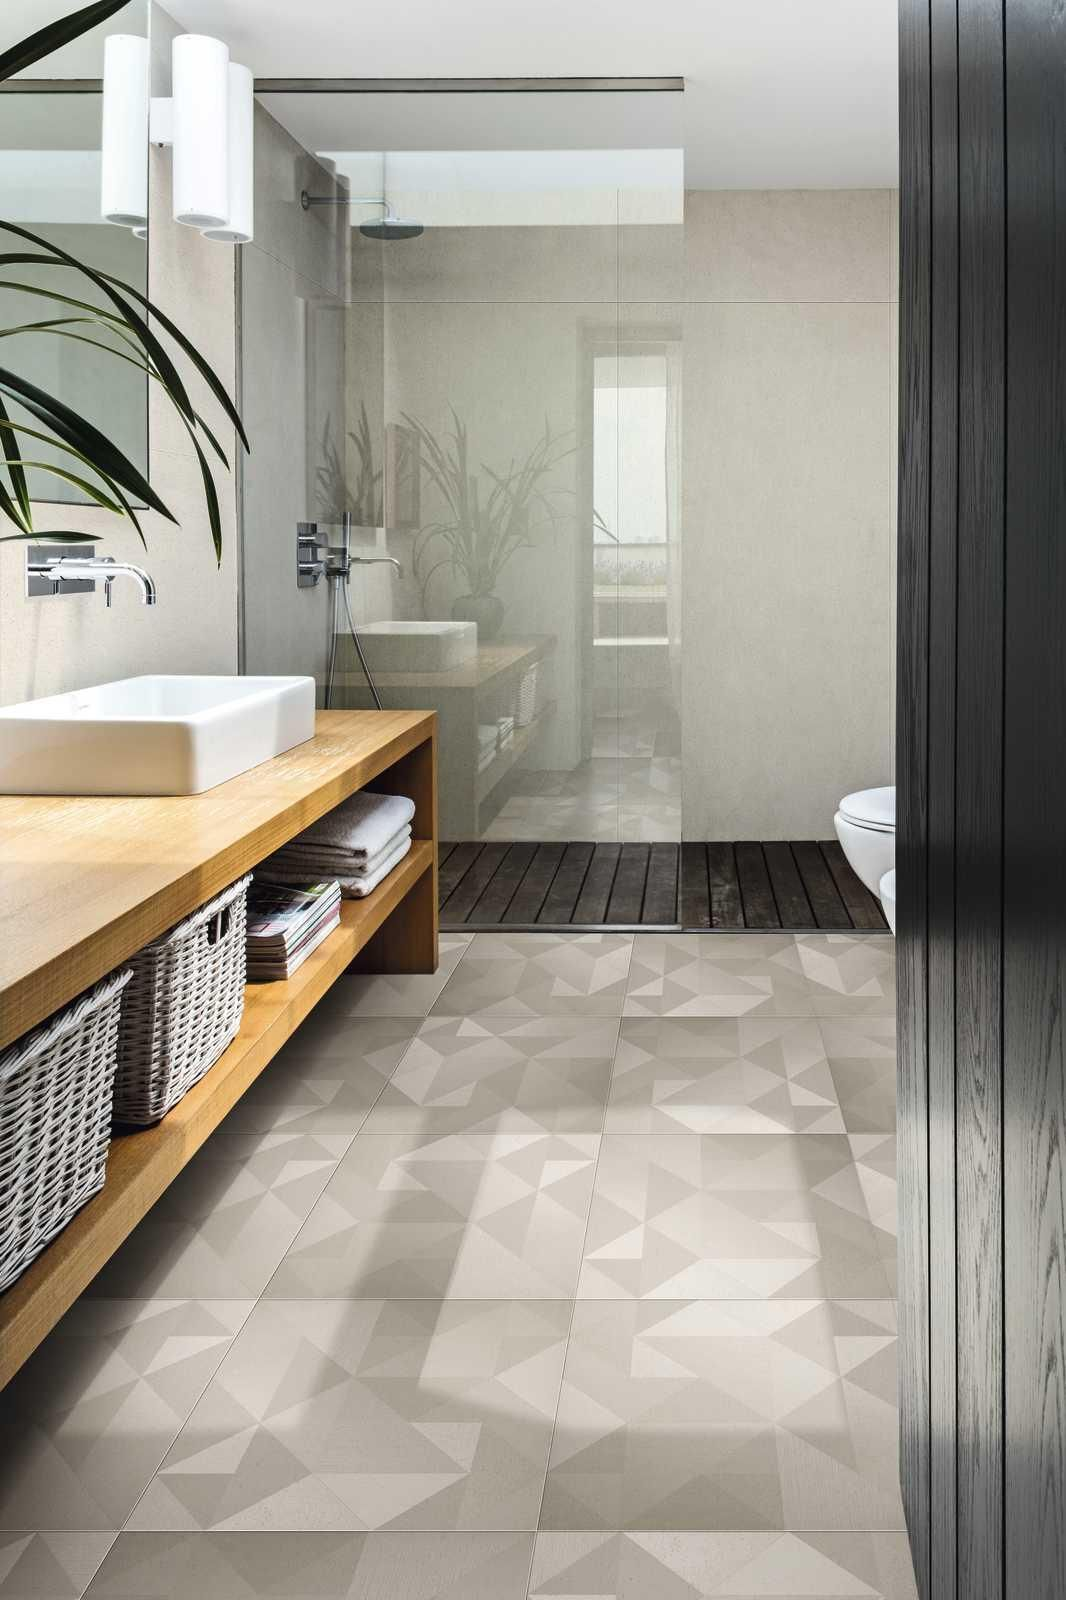 Bathroom Floor Tile Design Ideas Bathroomfloortile Bathroom Floor